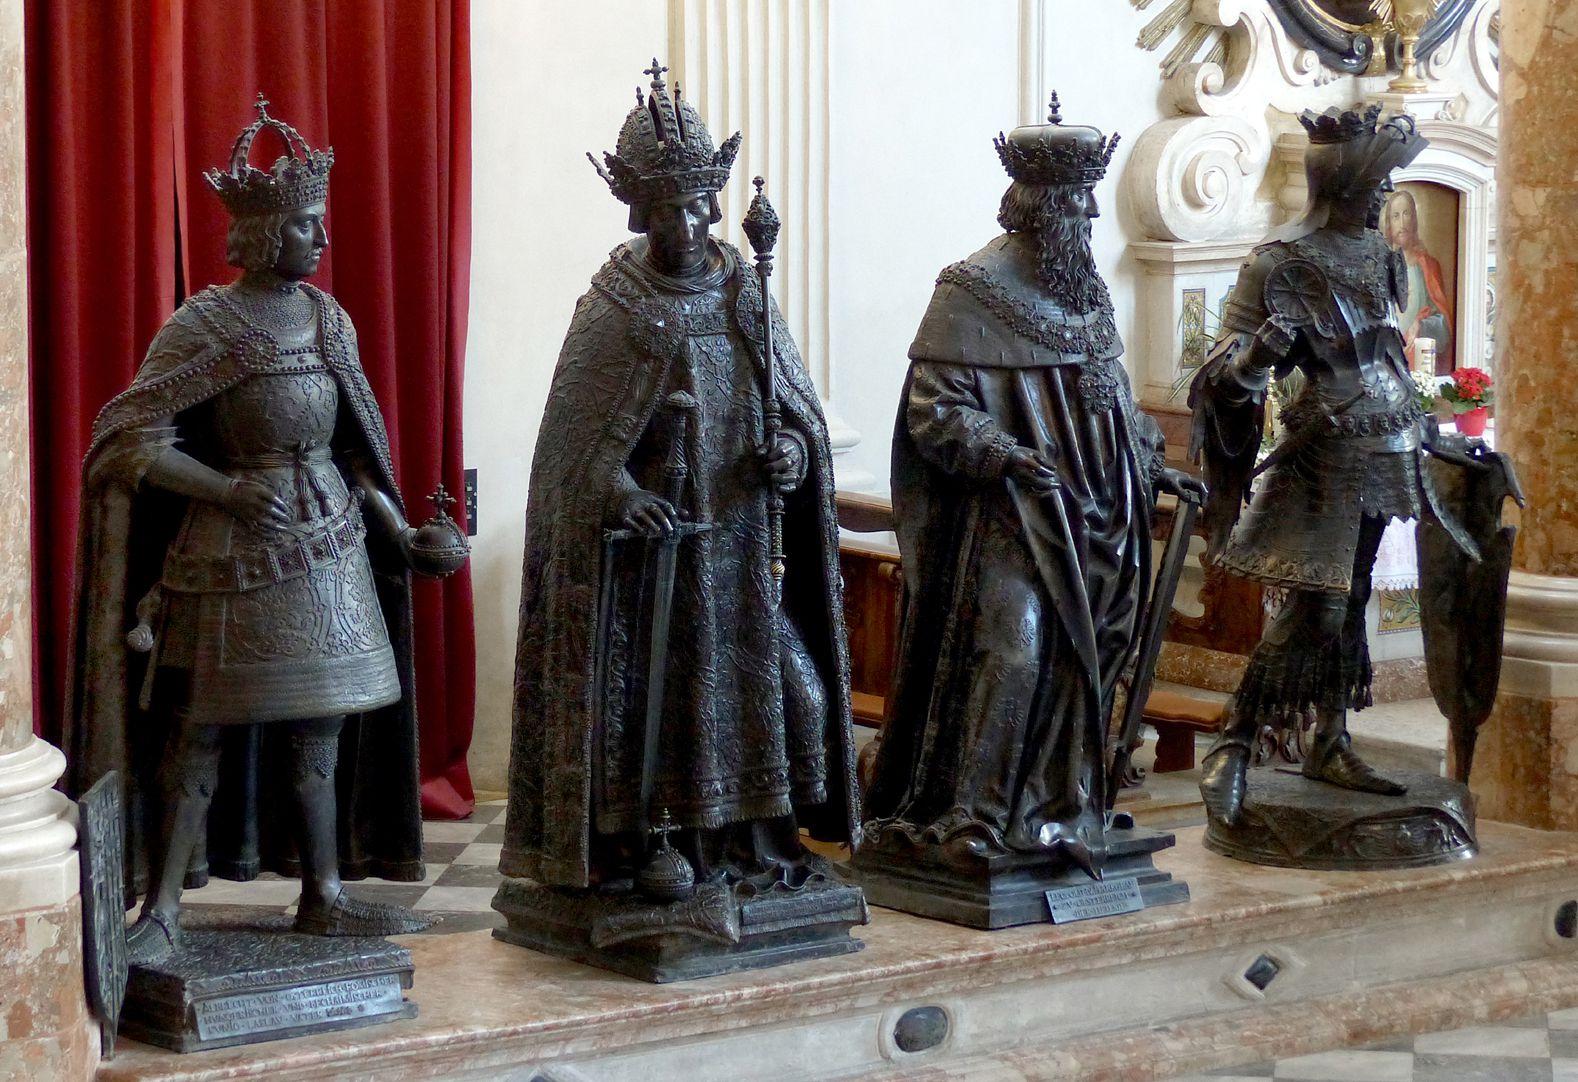 Leopold III (Innsbruck) Men´s side, third from the left